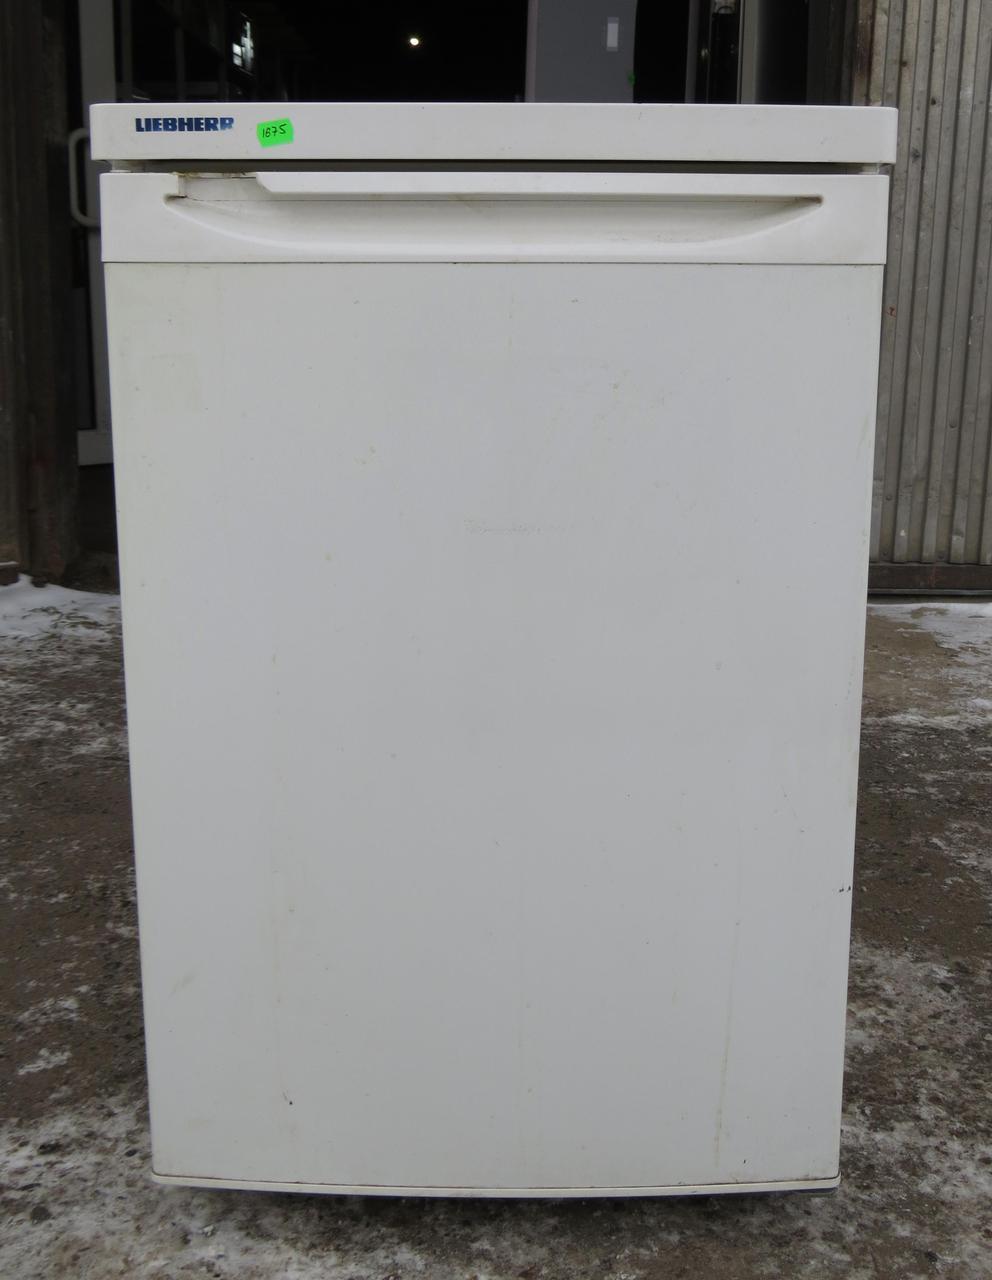 Холодильник LIEBHERR KTS 15340 Index 26B / 210 (Код:1675) Состояние: Б/У